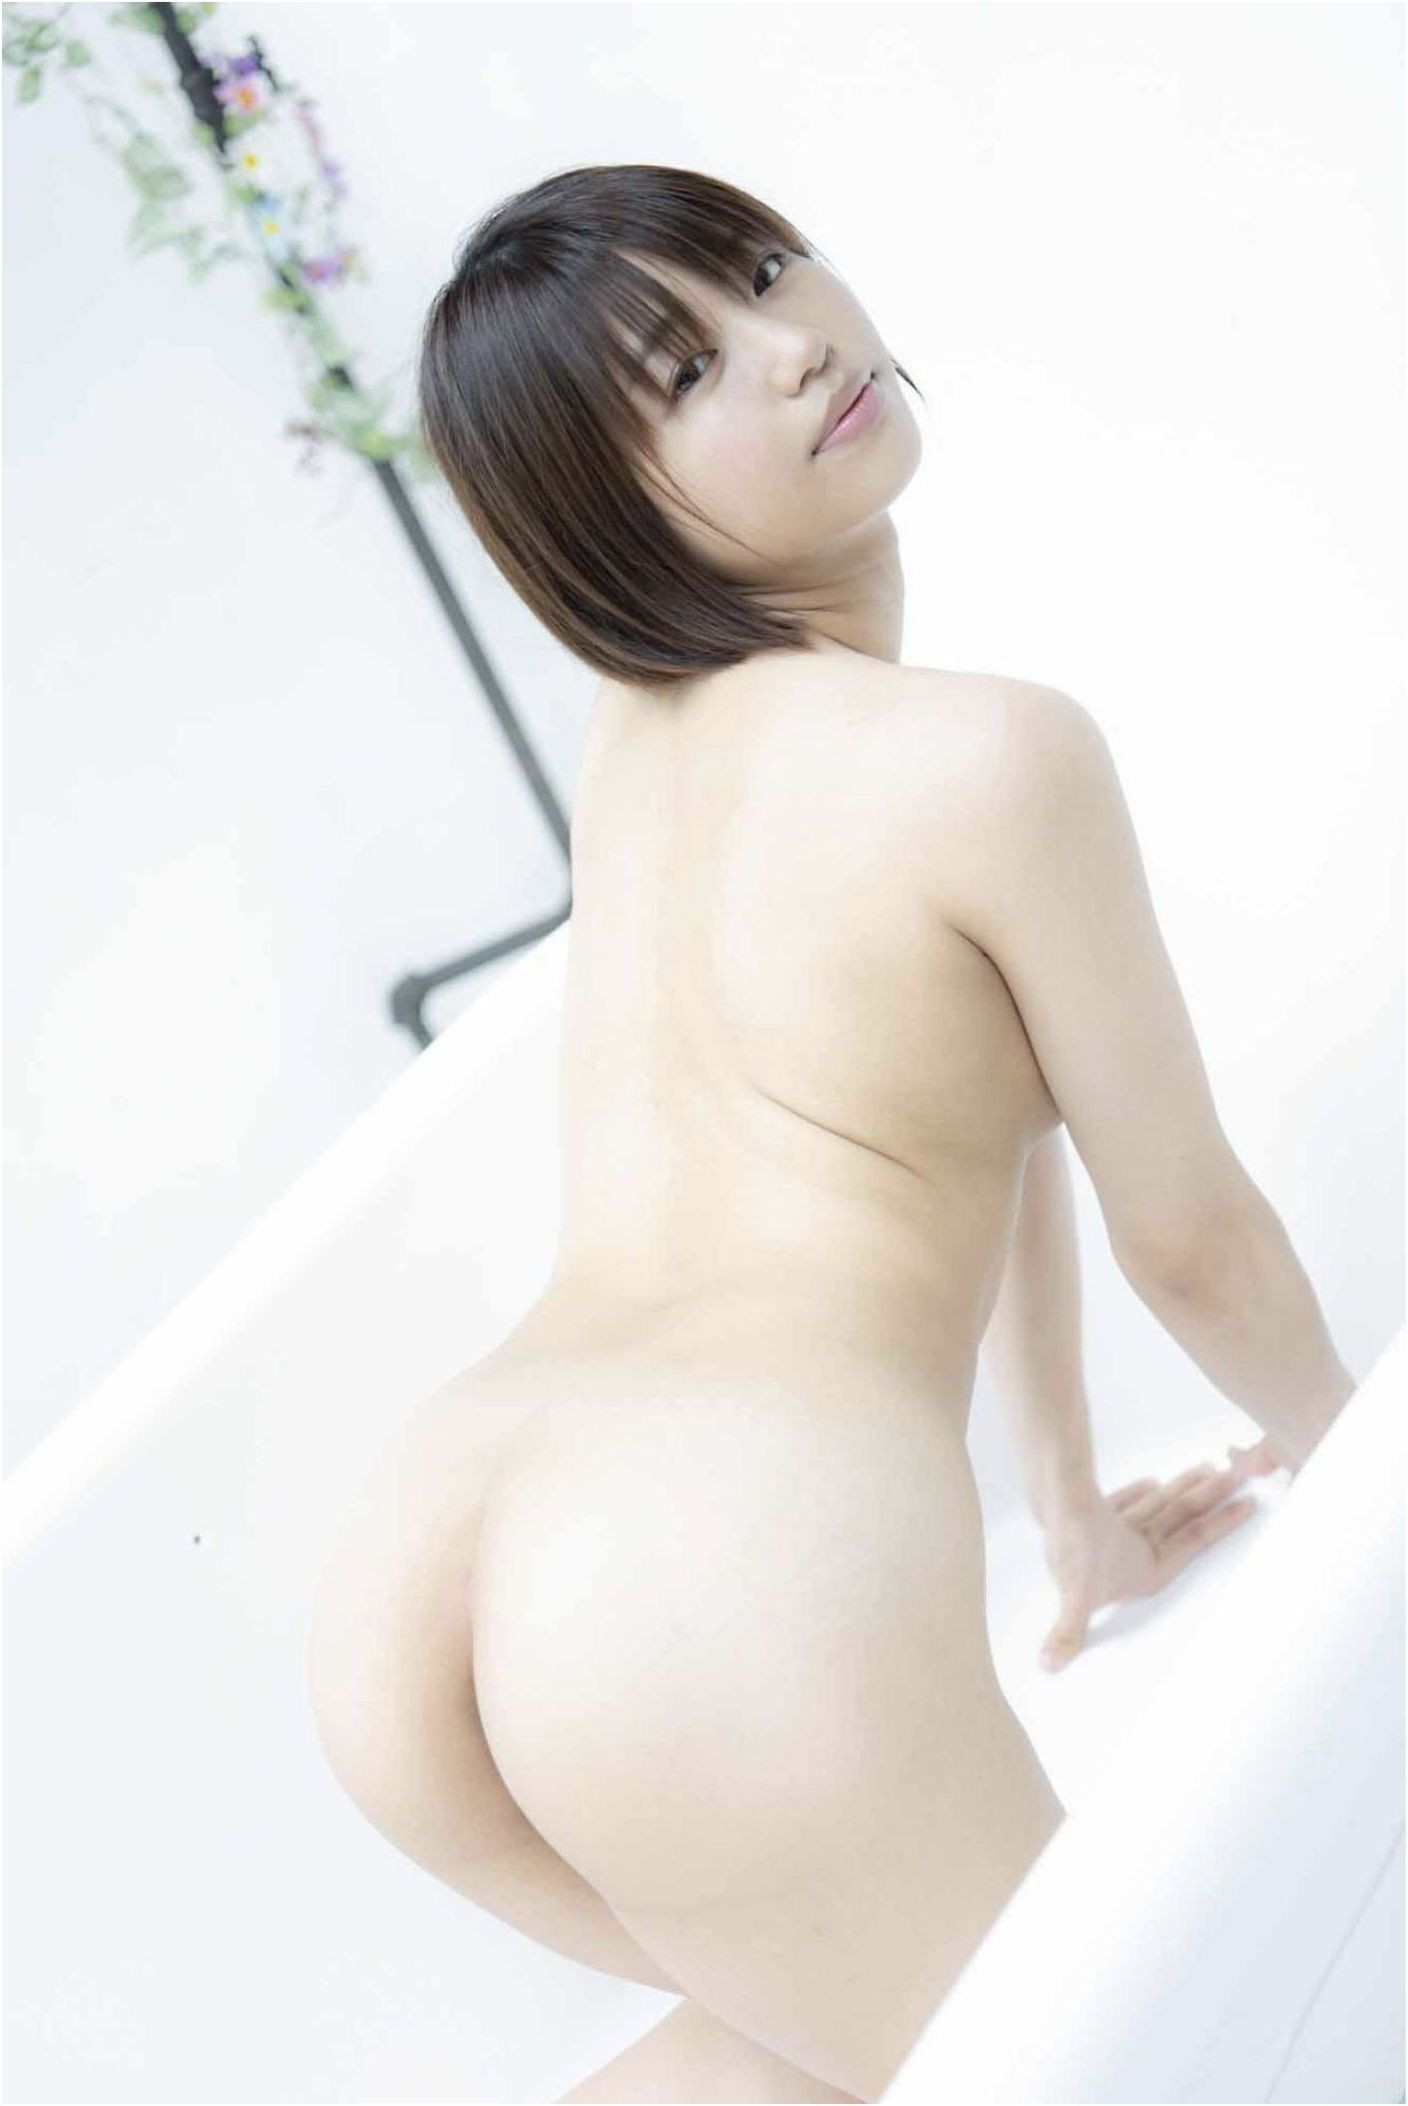 SOFT ON DEMAND GRAVURE COLLECTION 唯井まひろ01 photo 100